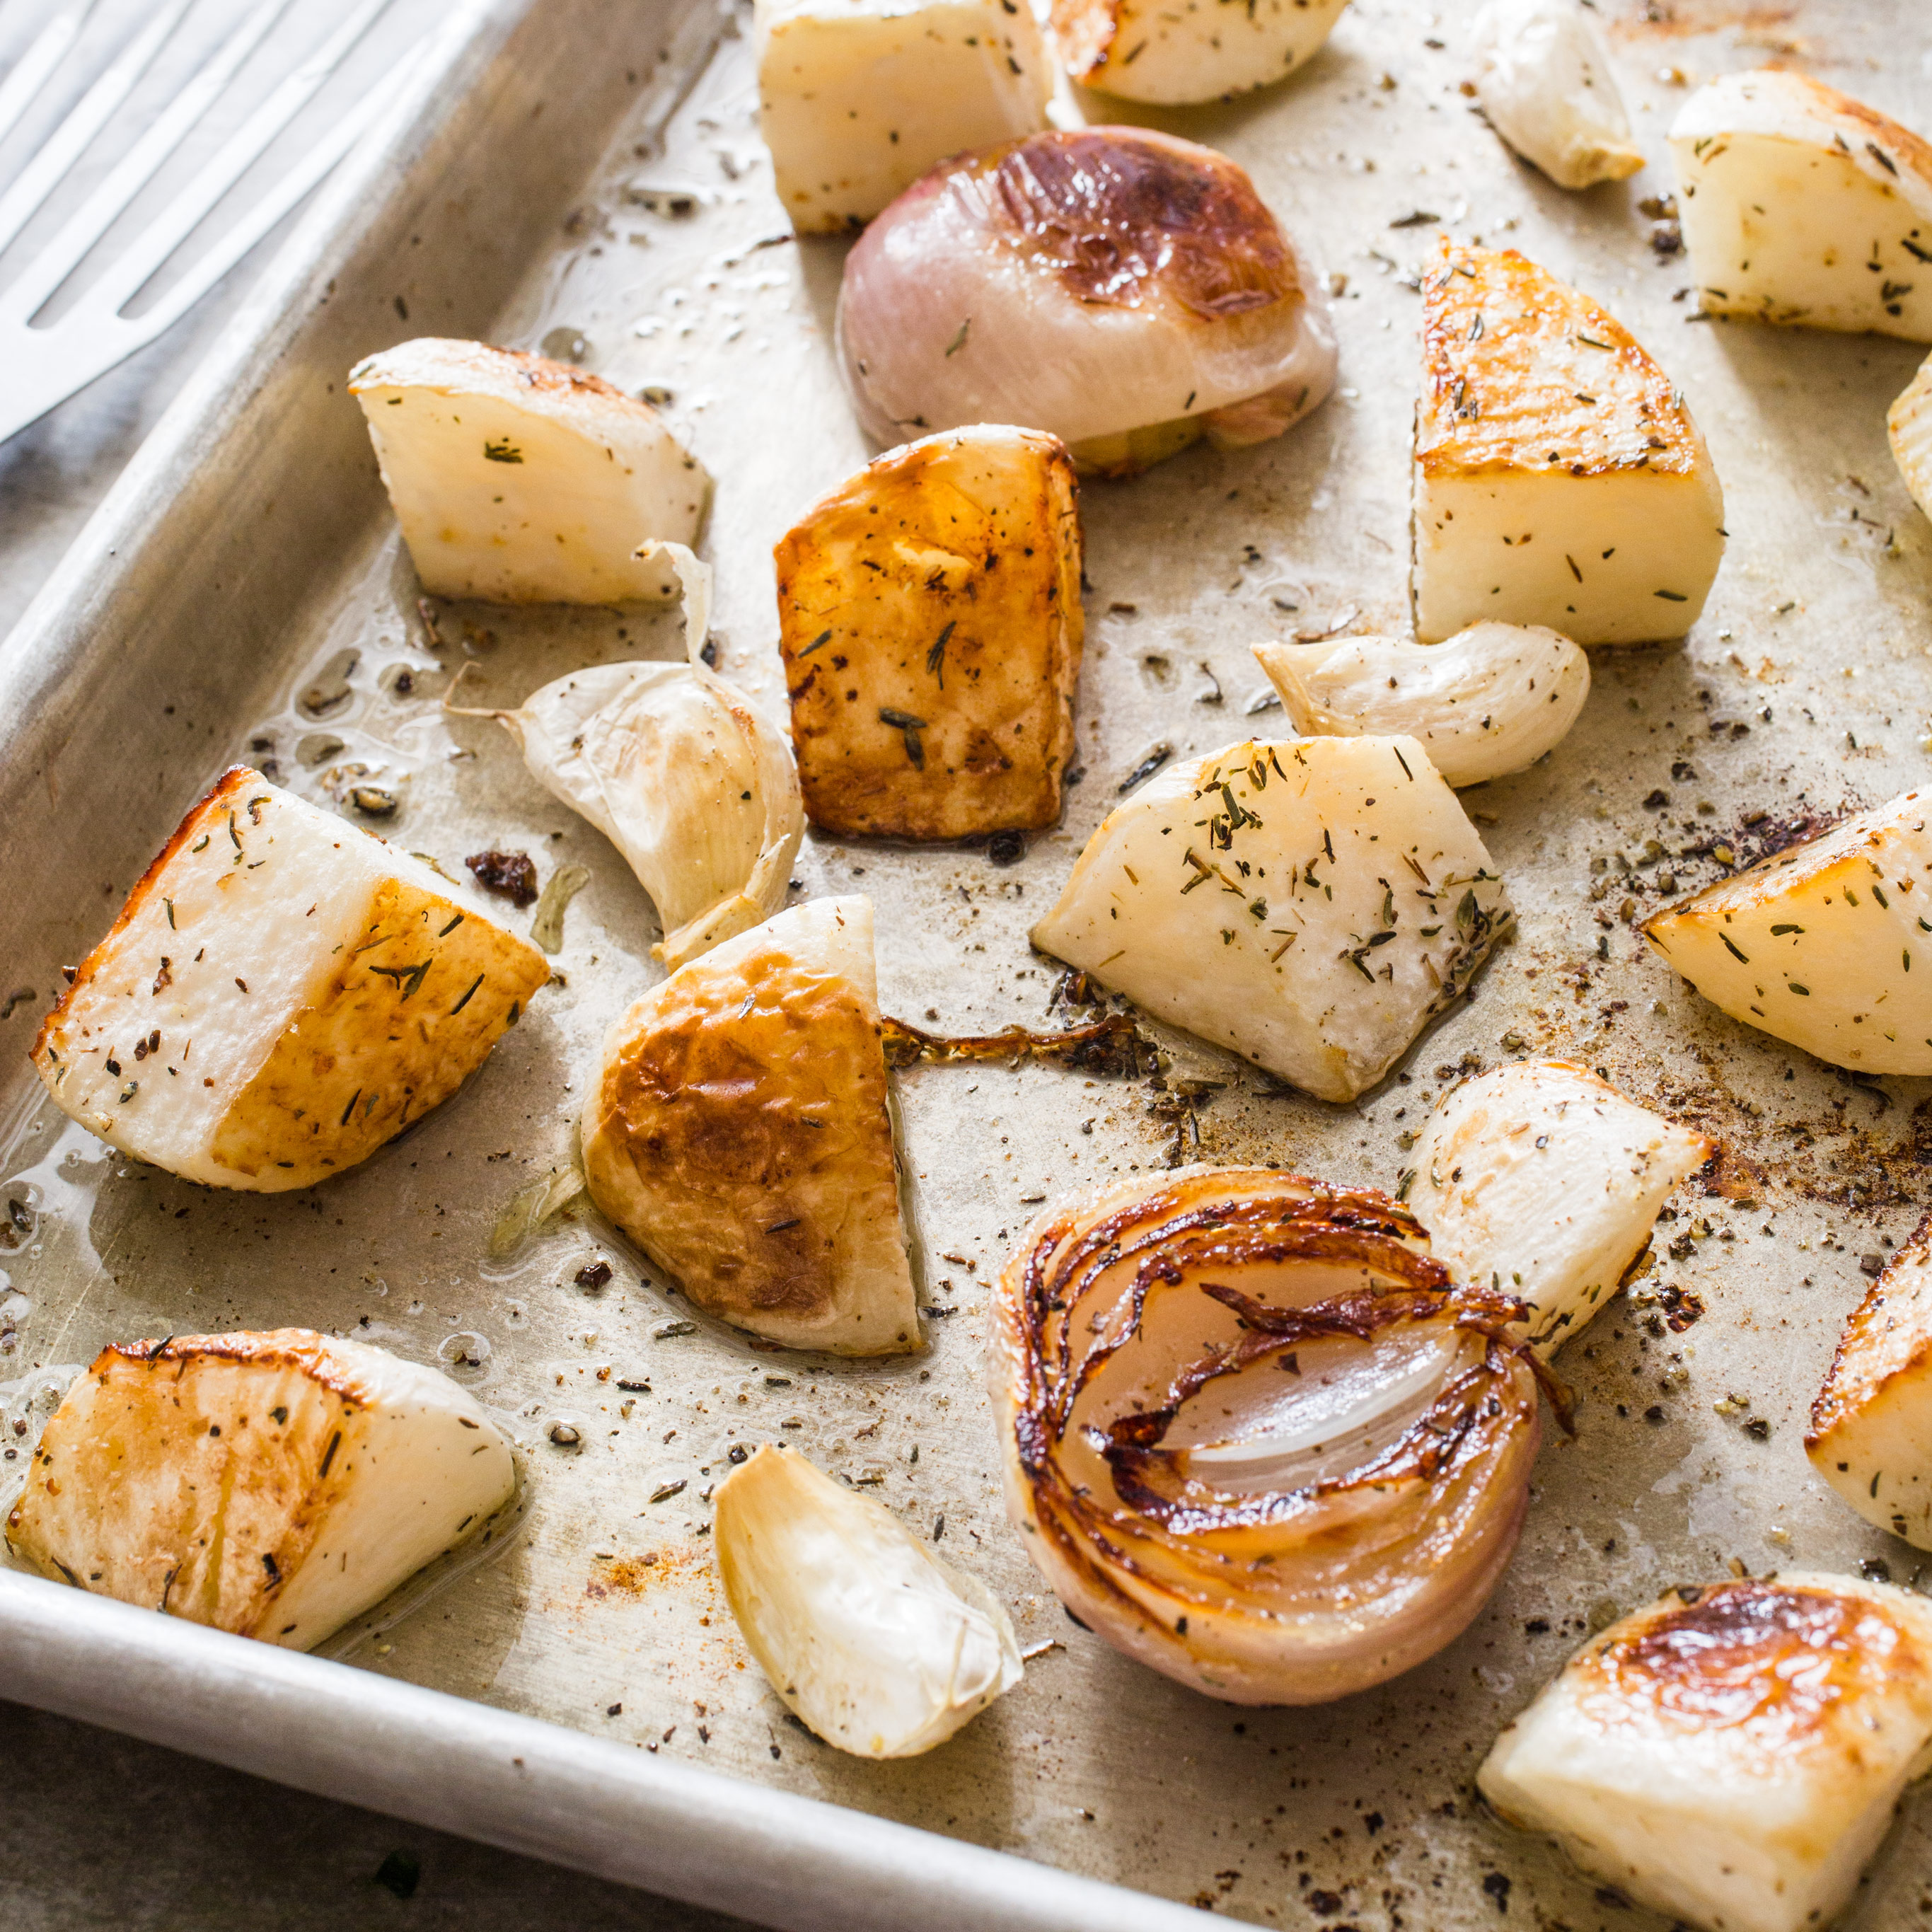 Roasted turnips bottoms